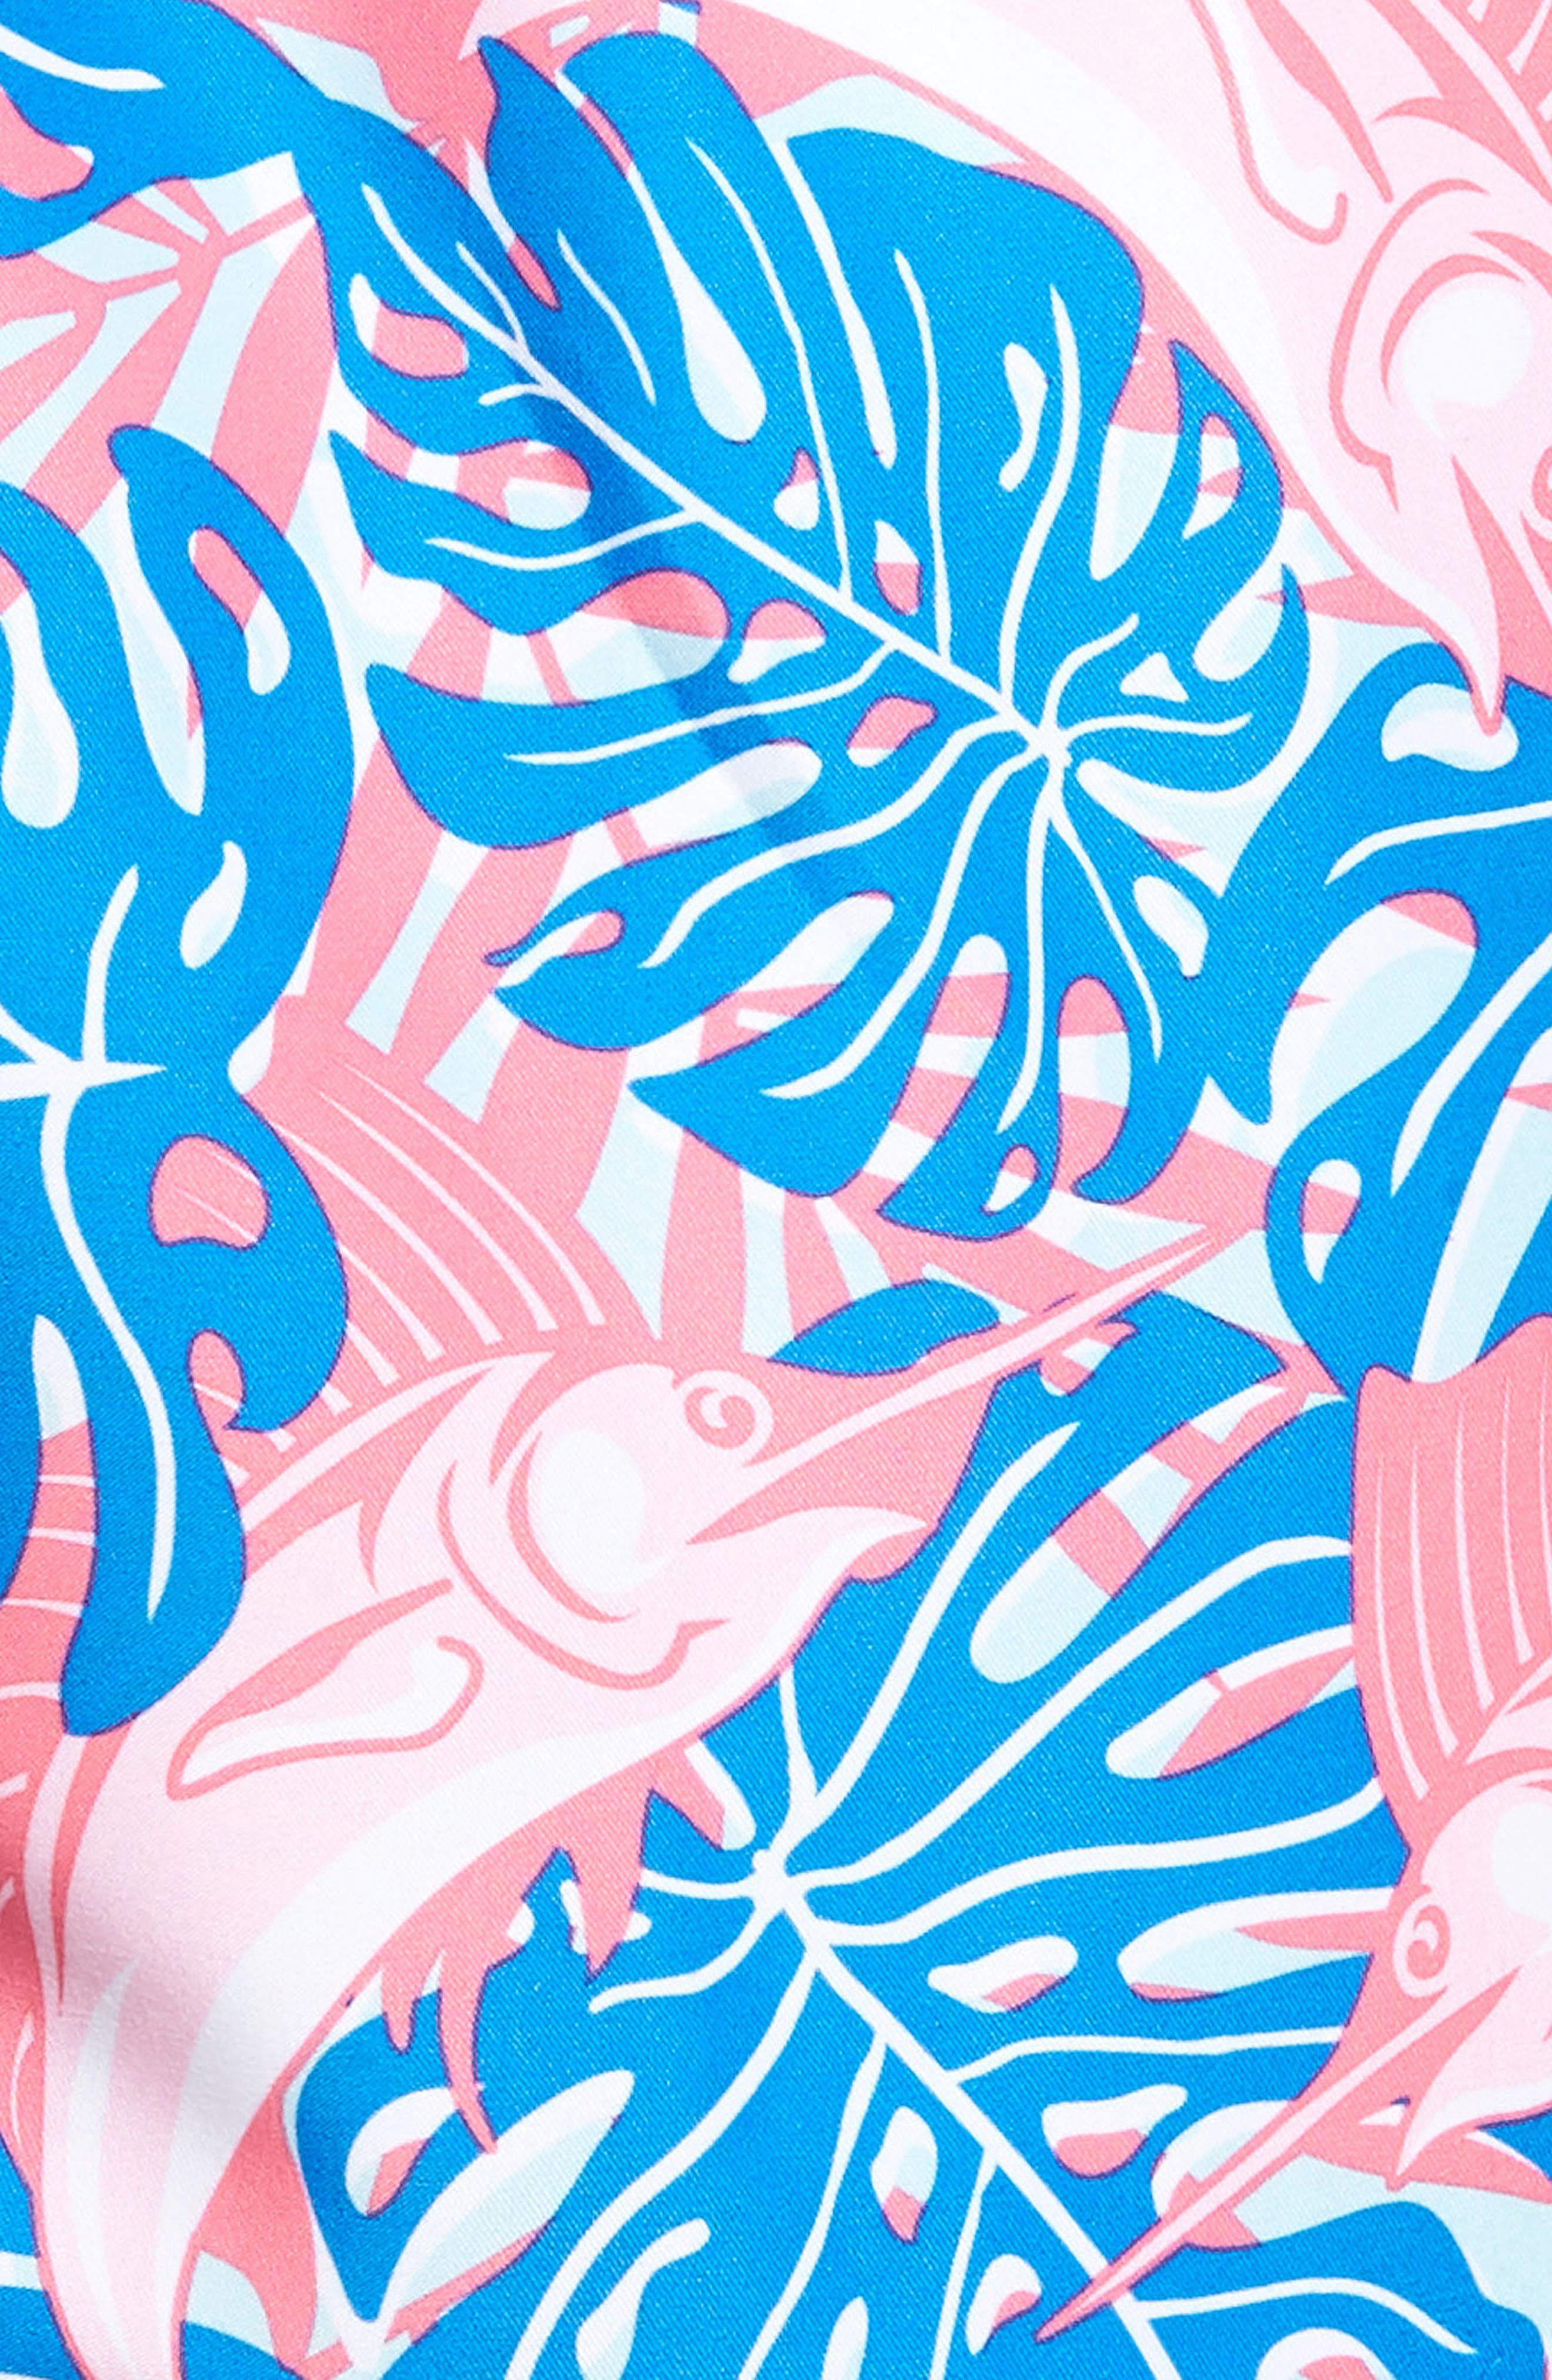 Sailfish & Leaves Chappy Swim Trunks,                             Alternate thumbnail 5, color,                             474